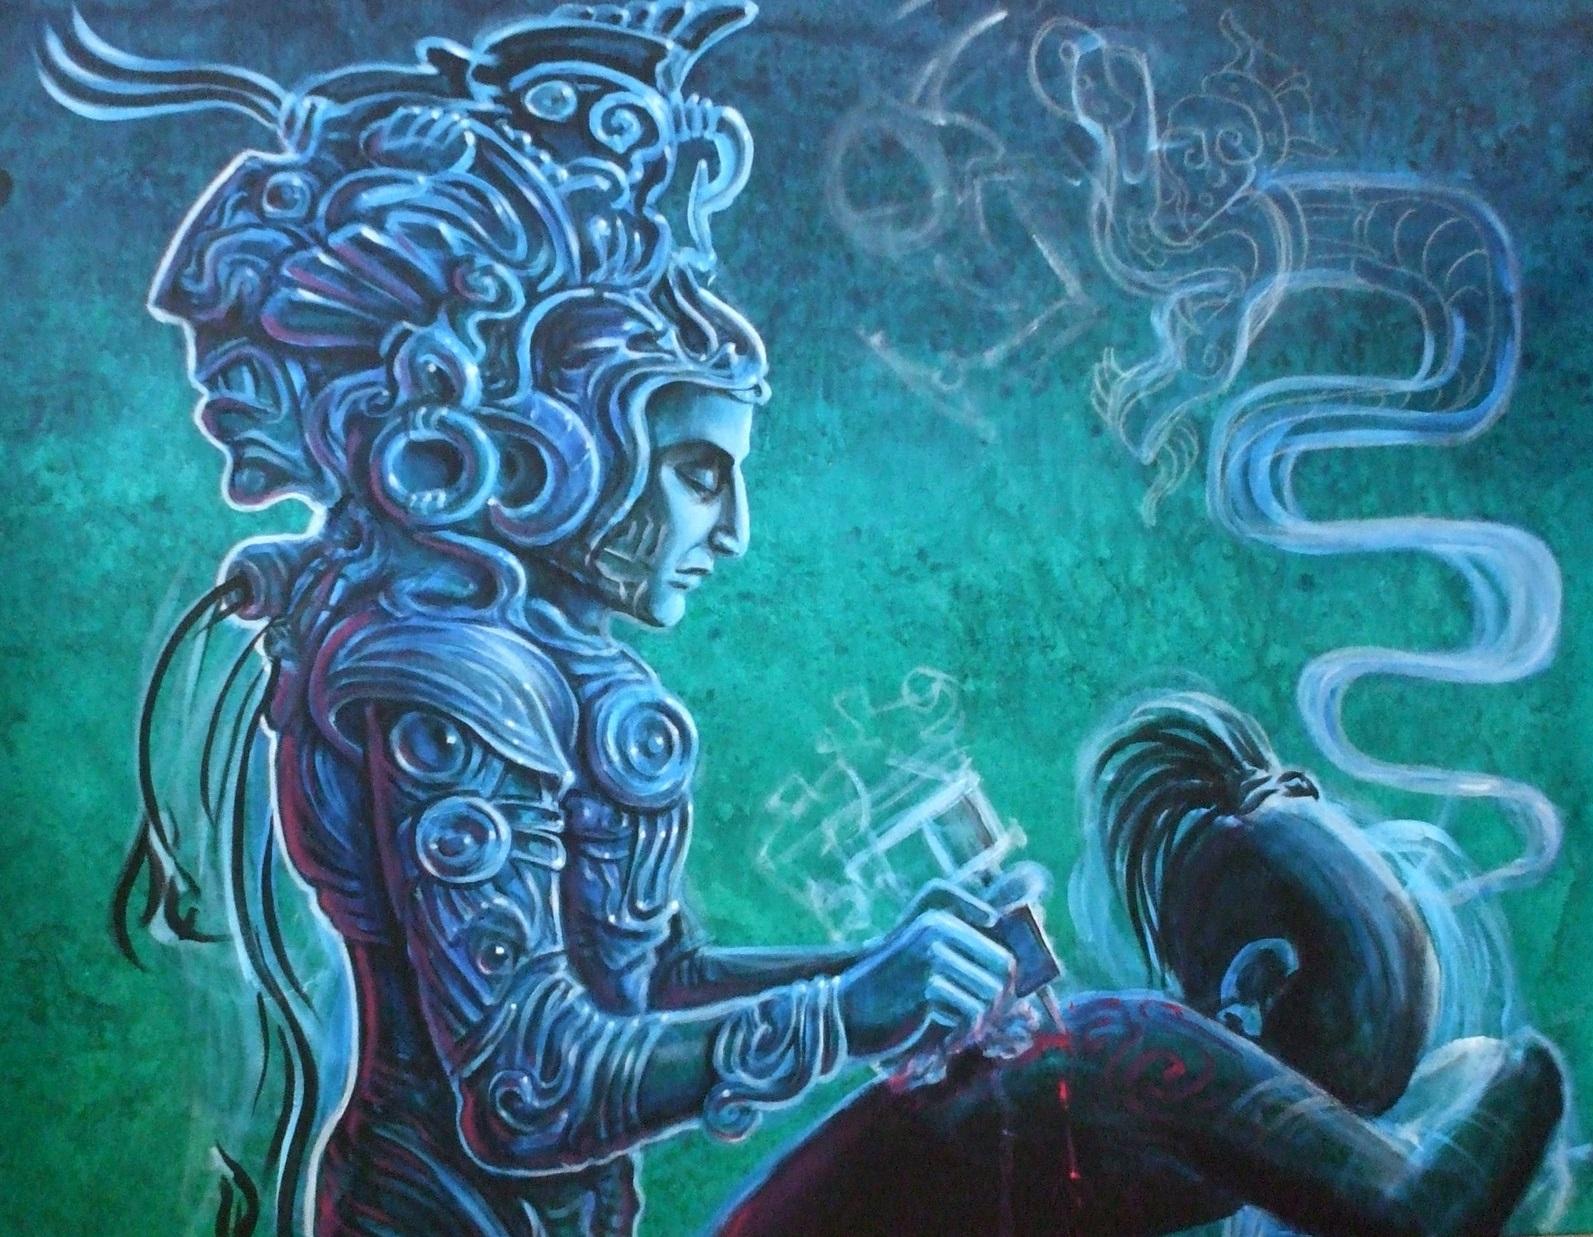 Le dieu de tatouage maya Acat.